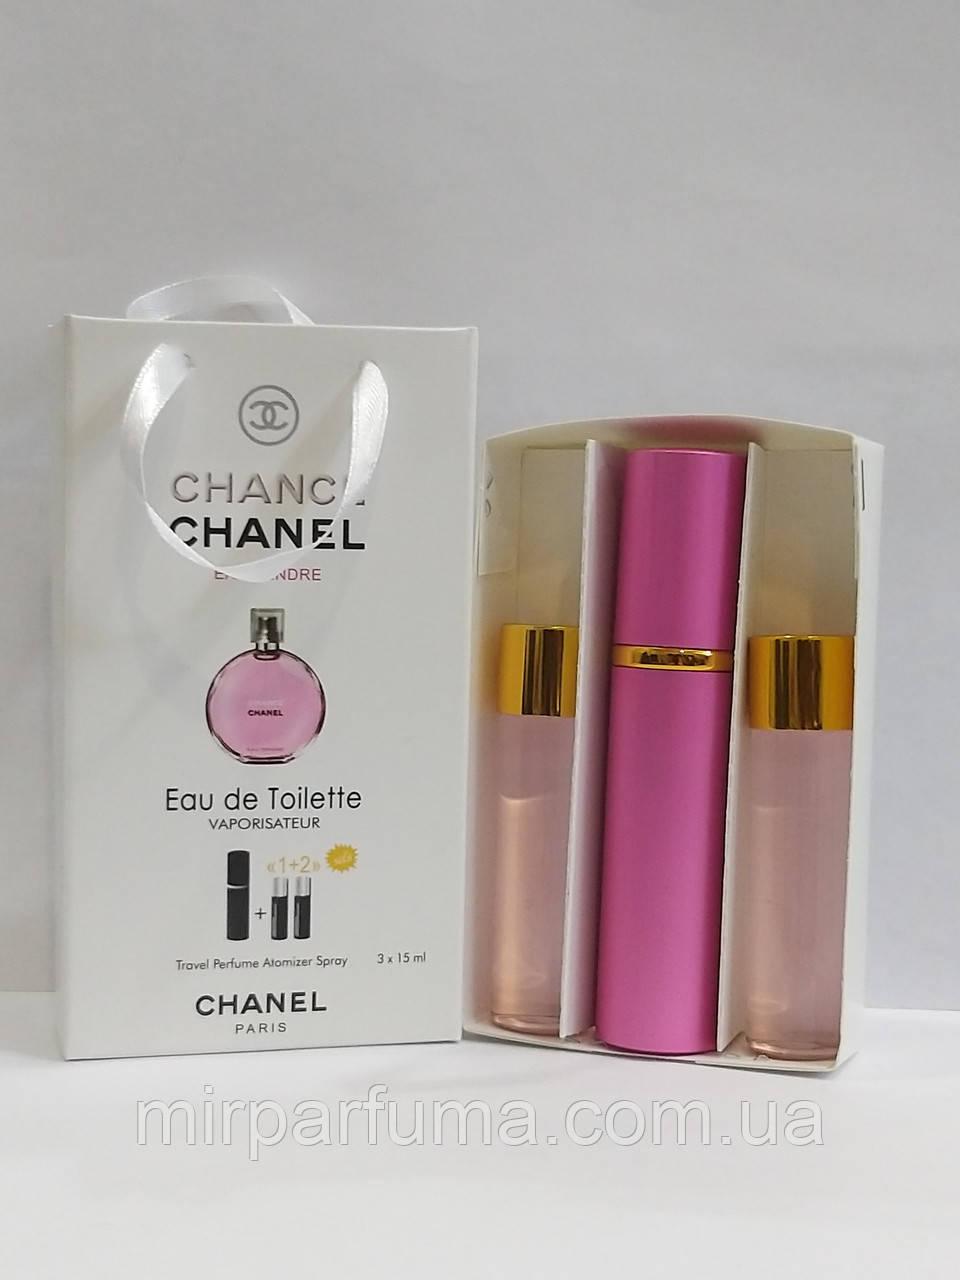 Подарочные мини духи 3*15мл Chanel Chance Tendre Woman 45ml